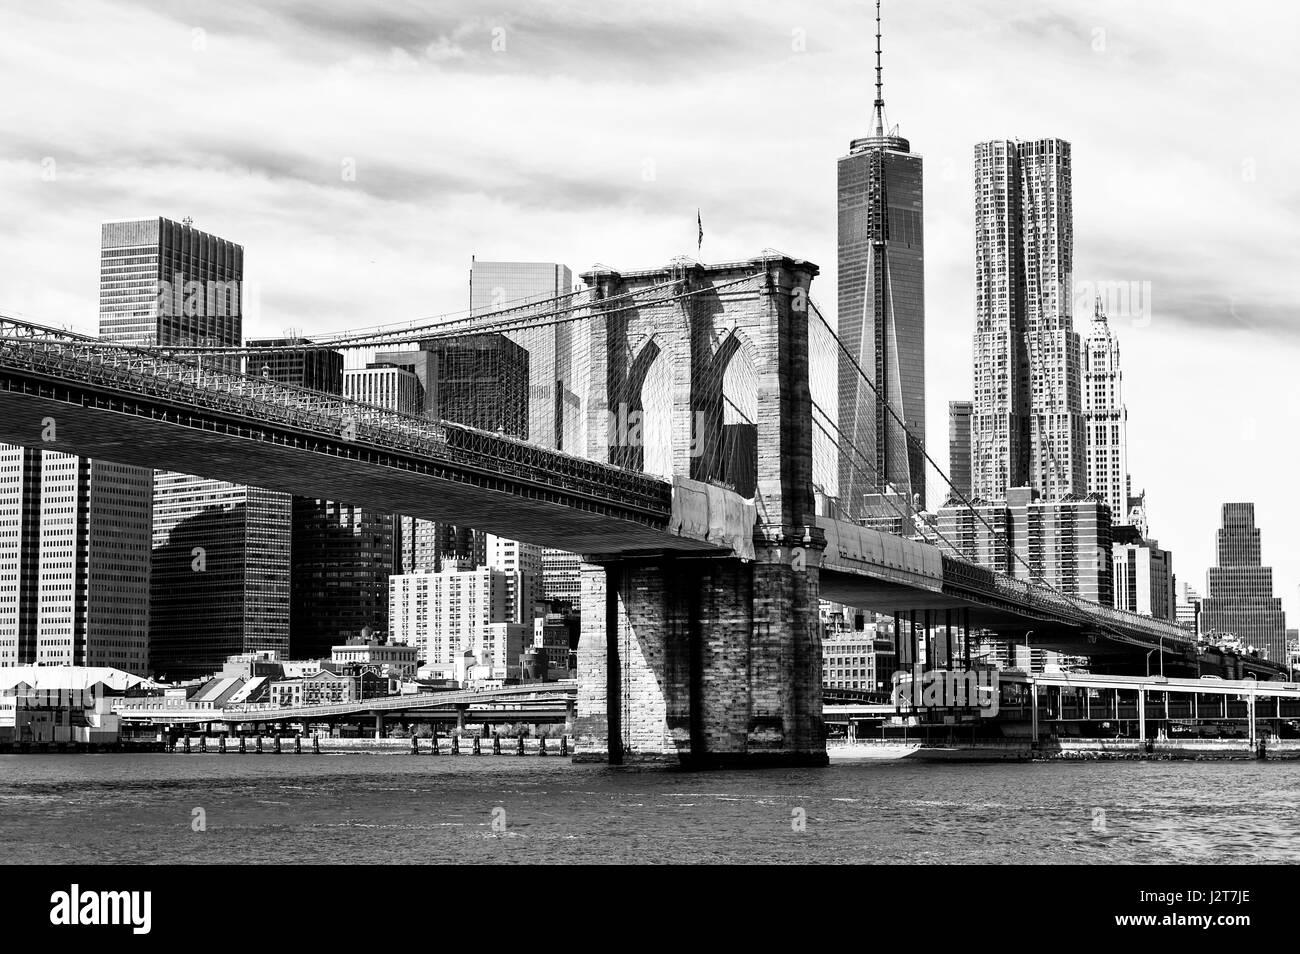 The Manhattan skyline and Brooklyn Bridge at night seen from Brooklyn Bridge Park in Brooklyn, New York. Stock Photo